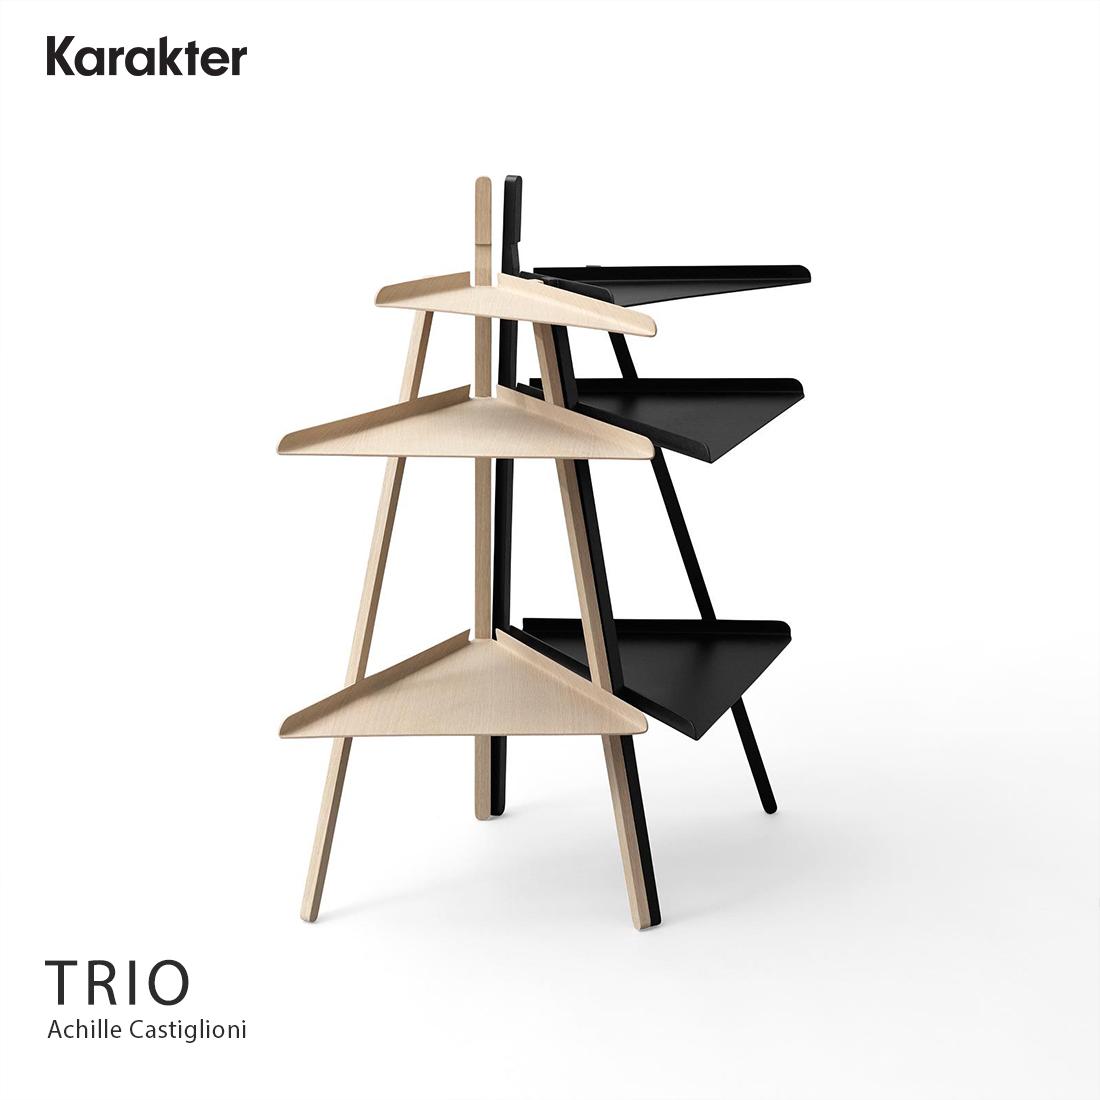 【KARAKTER カラクテー】TRIO トリオ 三角棚 三角シェルフ Achille Castiglioni カスティリオーニ